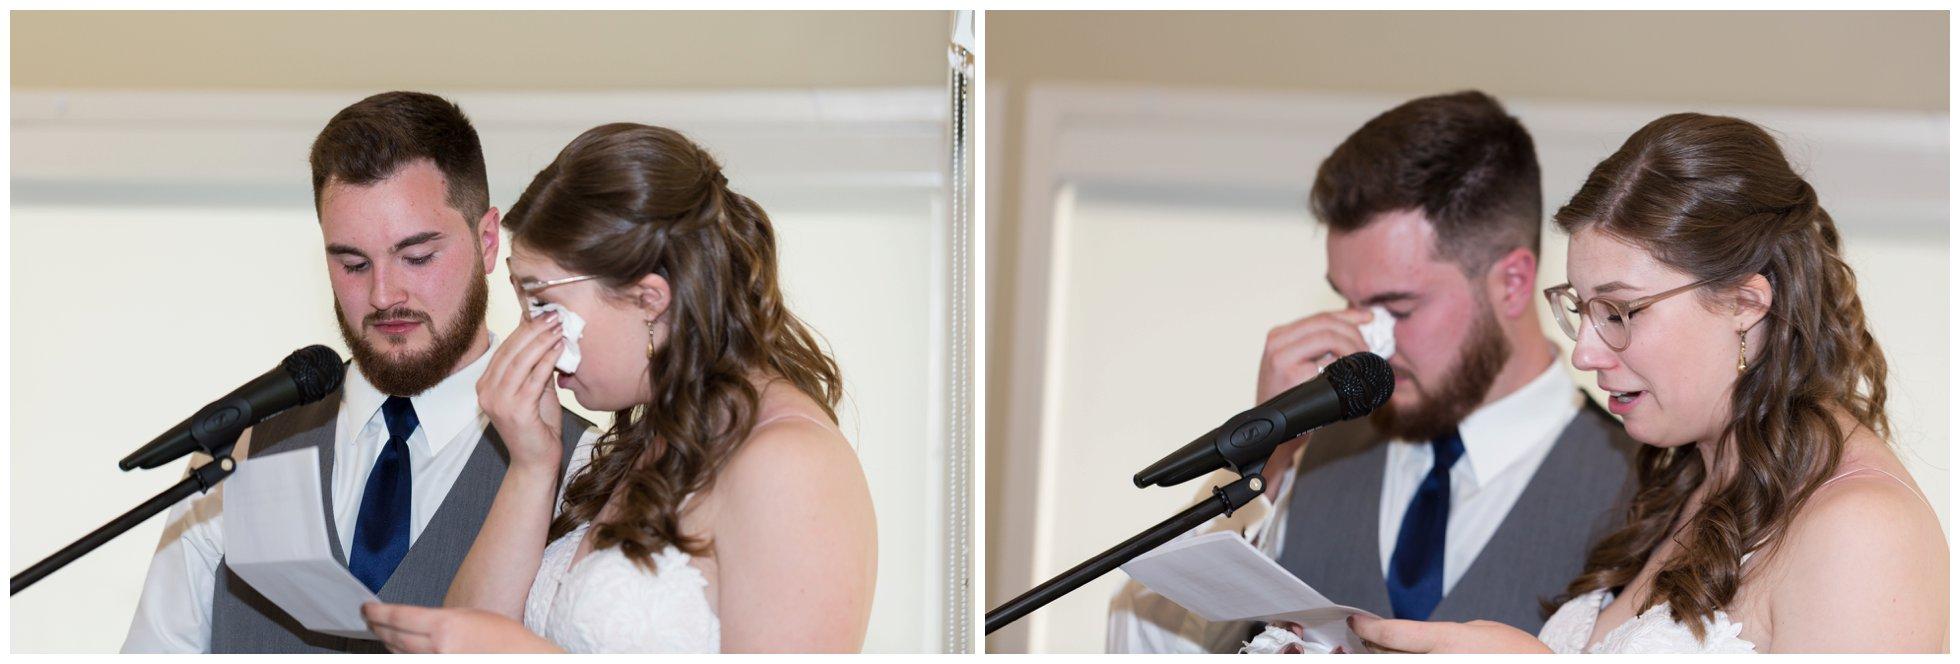 Emily and Royden Edmonton Wedding (Life by Selena Photography)_0052.jpg